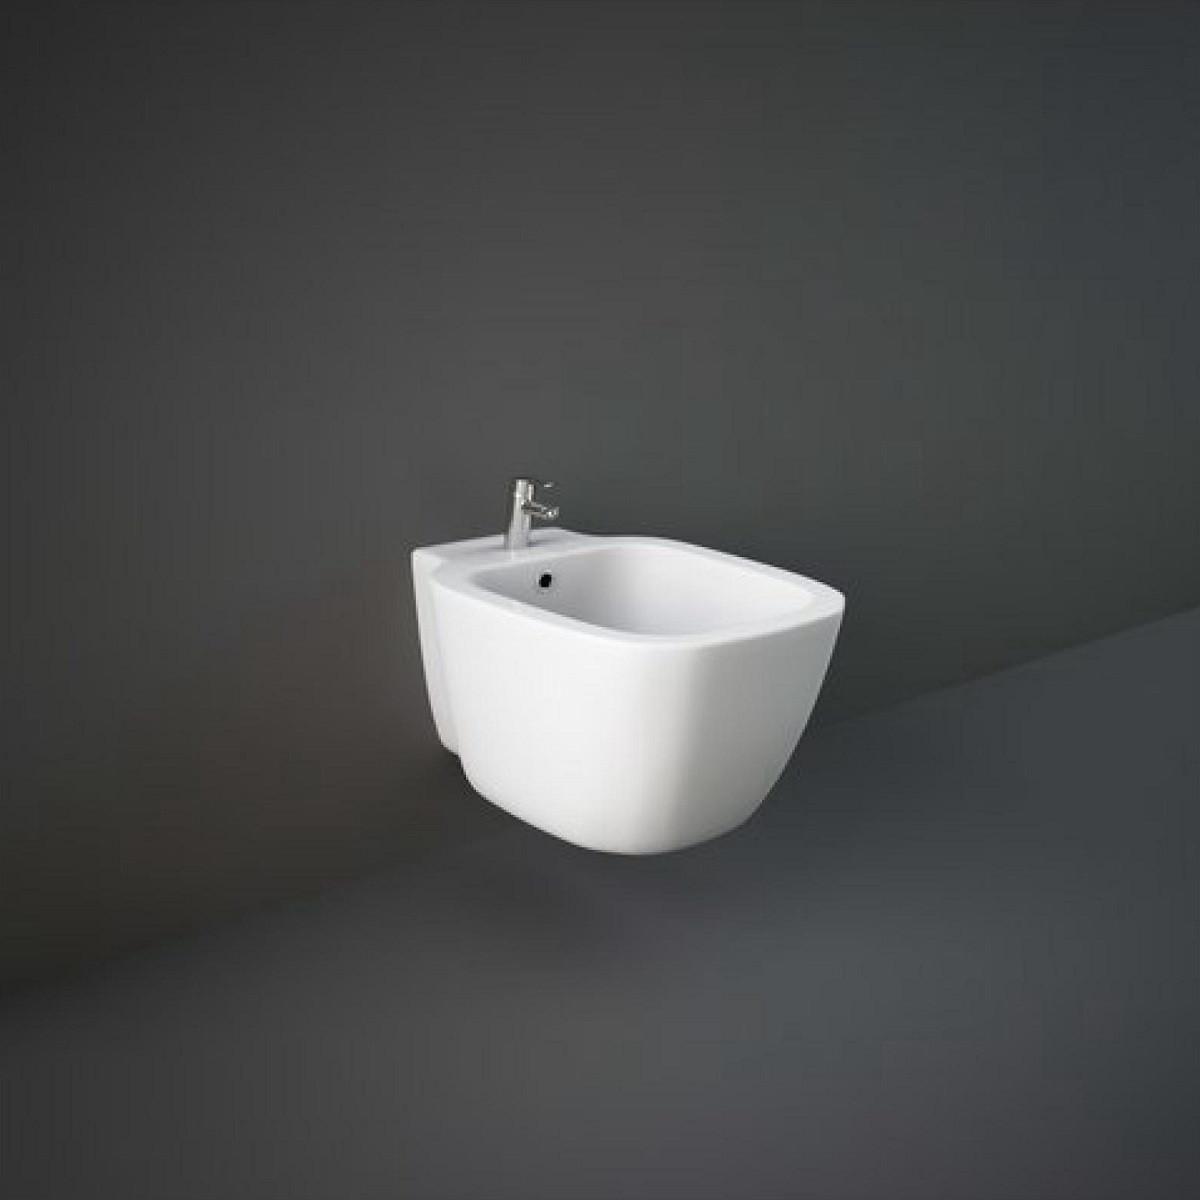 Биде подвесное RAK Ceramics One EL08AWHA